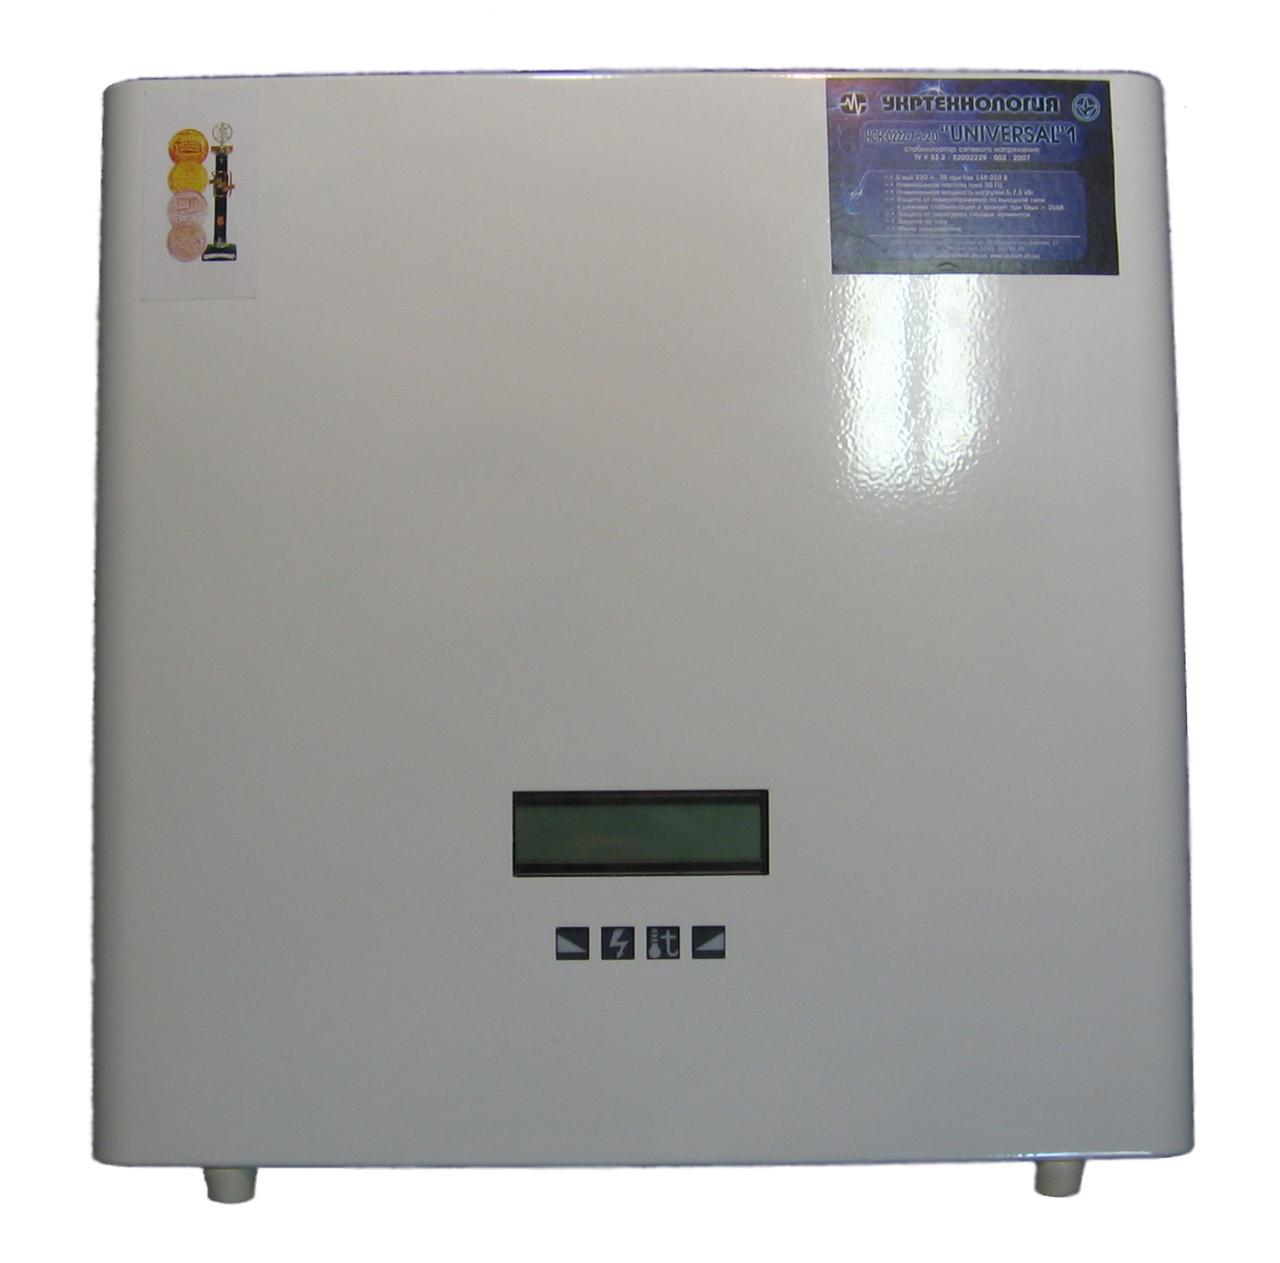 Однофазний стабілізатор напруги Universal НСН 20000 HV (20 кВт)